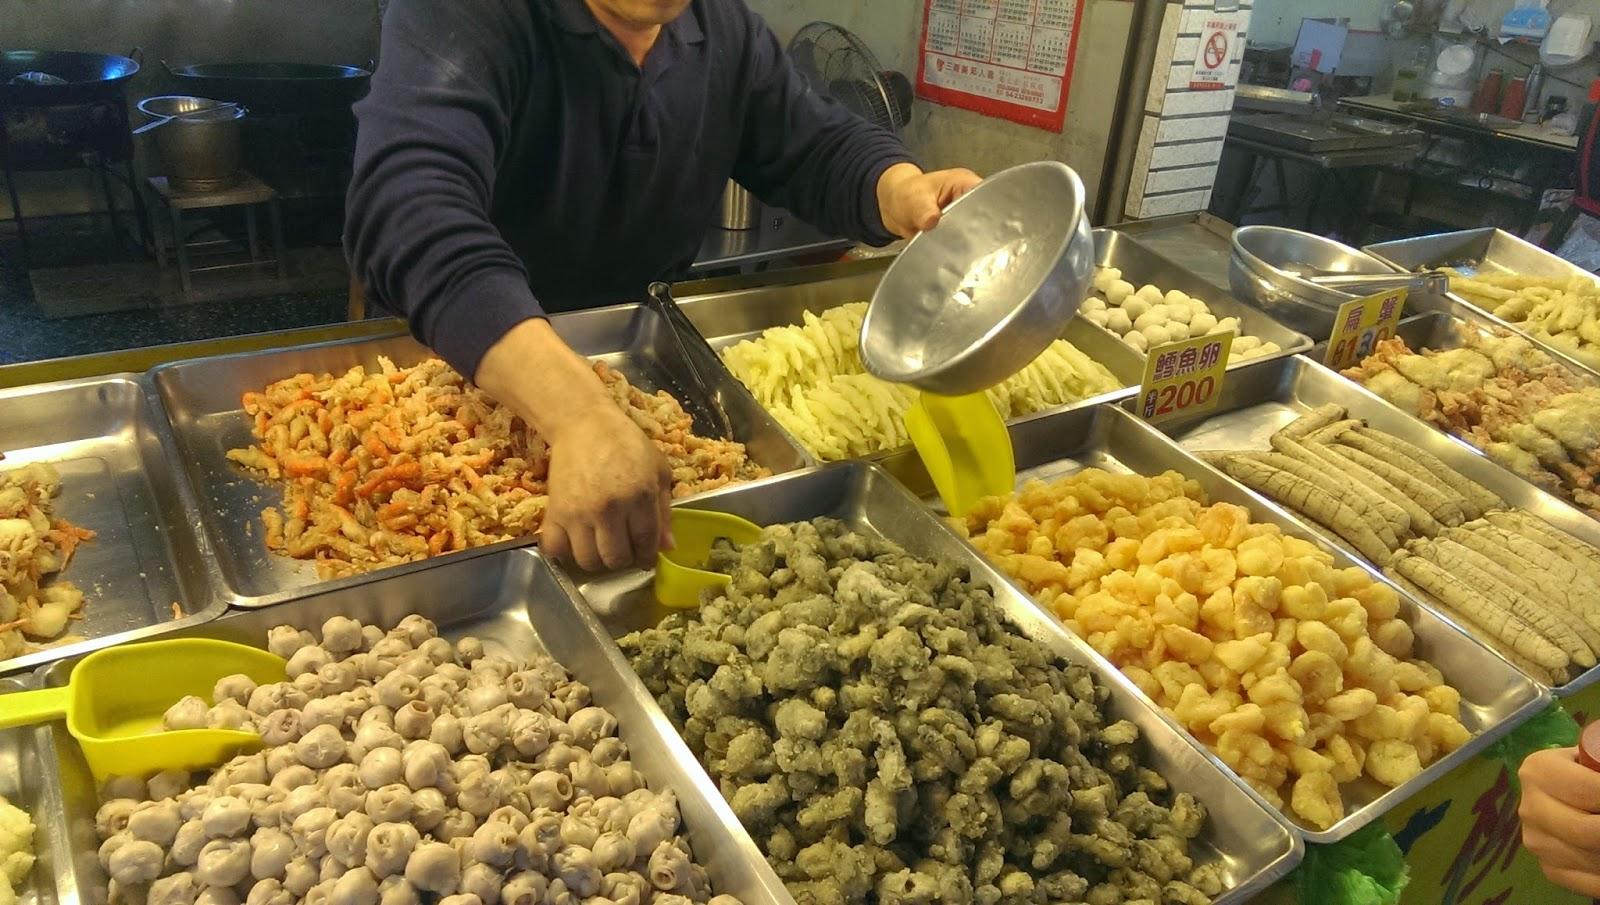 2015 02 02%2B13.22.52 - [食記] 葉家生魚片 - 布袋觀光漁市中的鮮魚餐廳